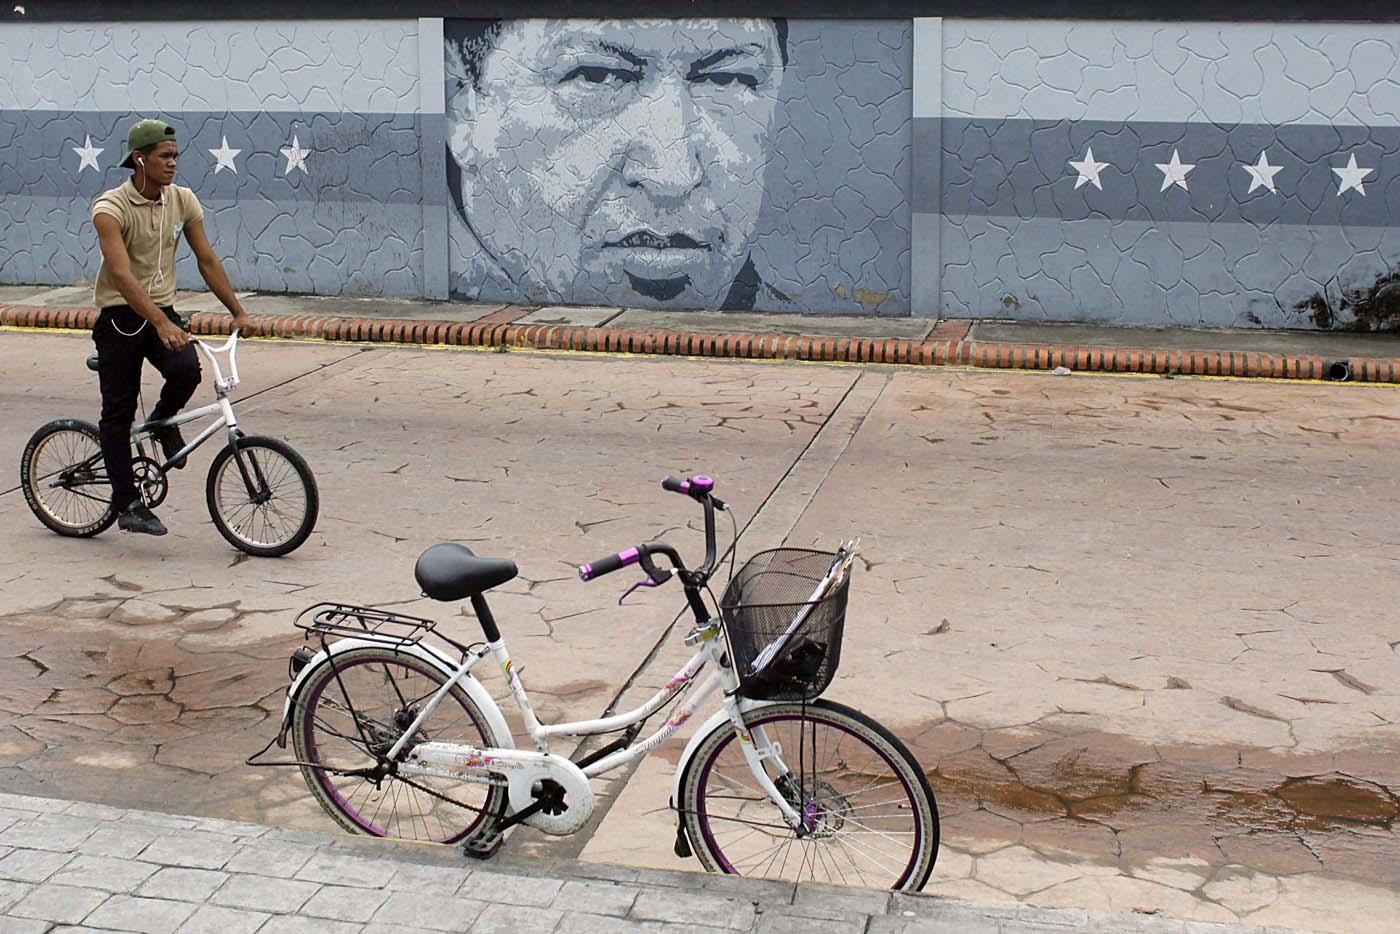 A man rides a bicycle in front a mural depicting Venezuela's late President Hugo Chavez in Sabaneta, Venezuela June 13, 2017. Picture taken June 13, 2017. REUTERS/Carlos Eduardo Ramirez